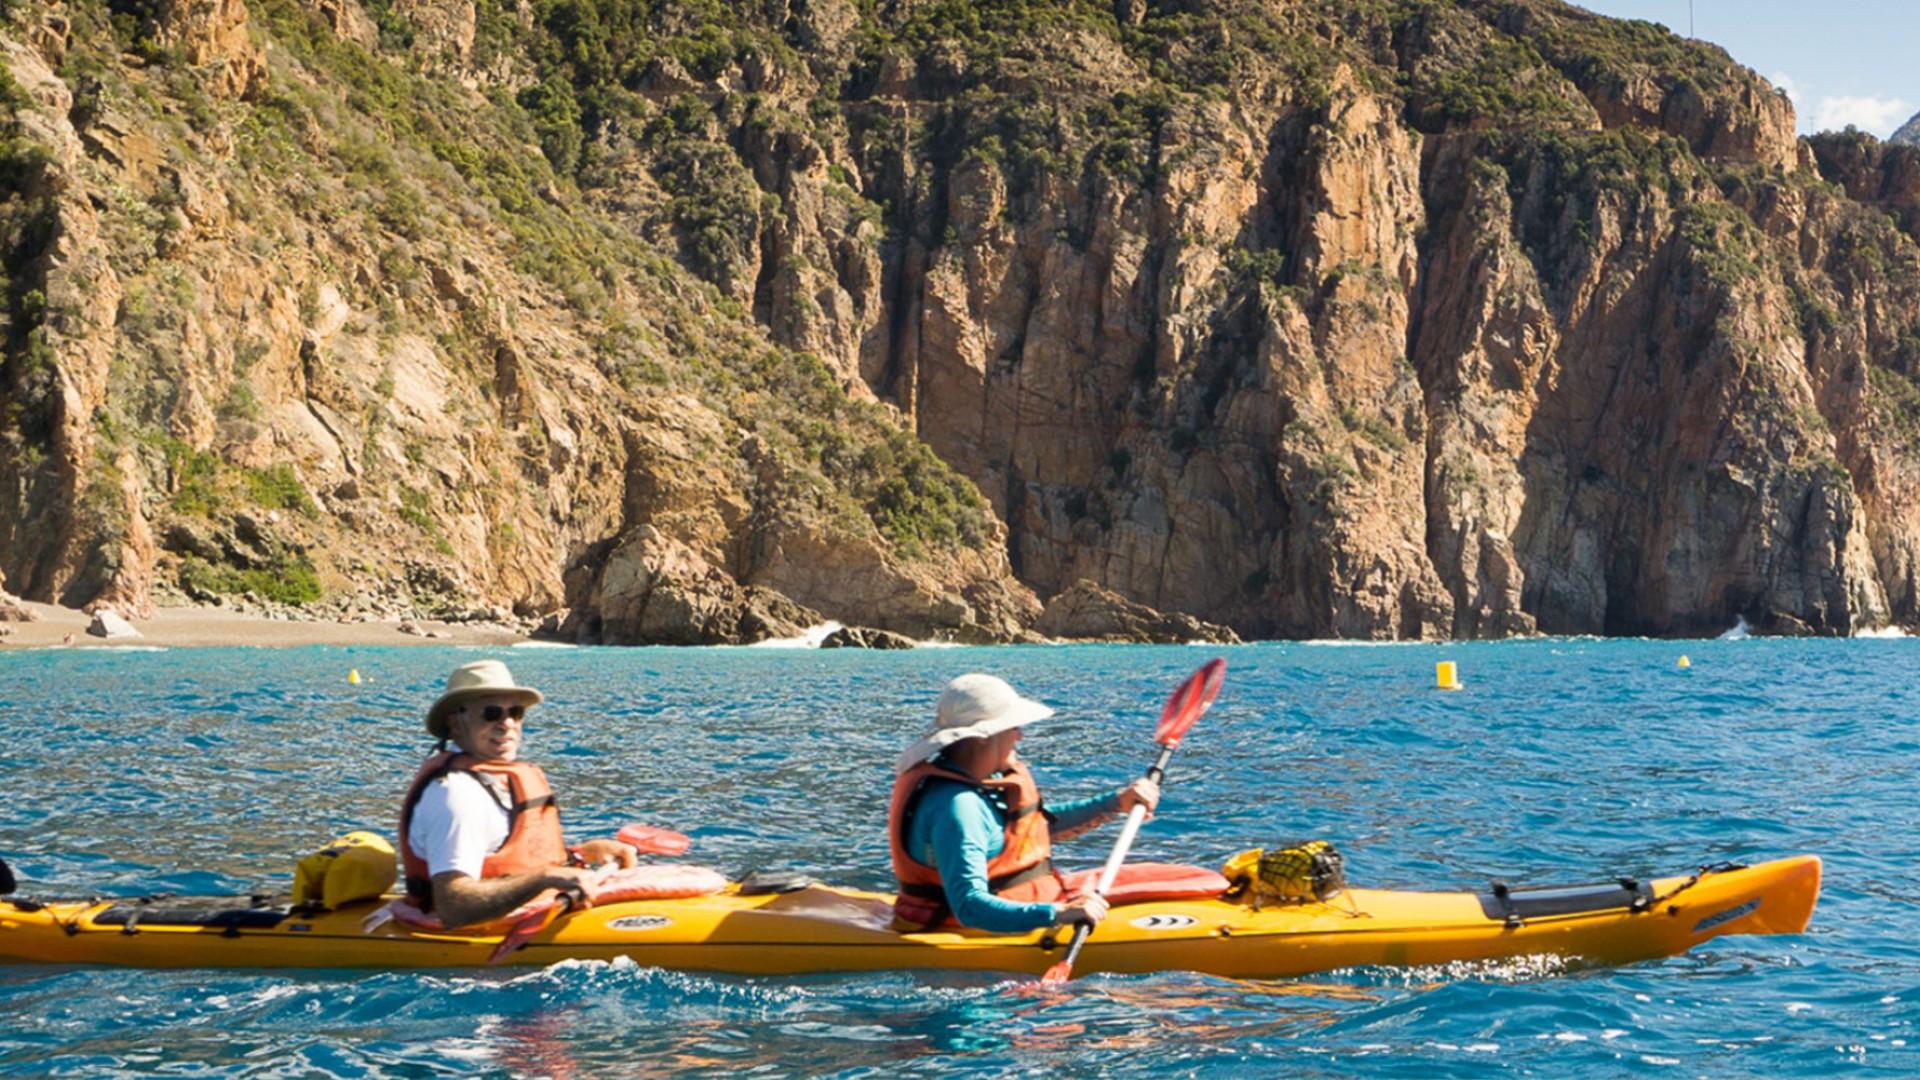 sea kayaks in Ocean near Corsica